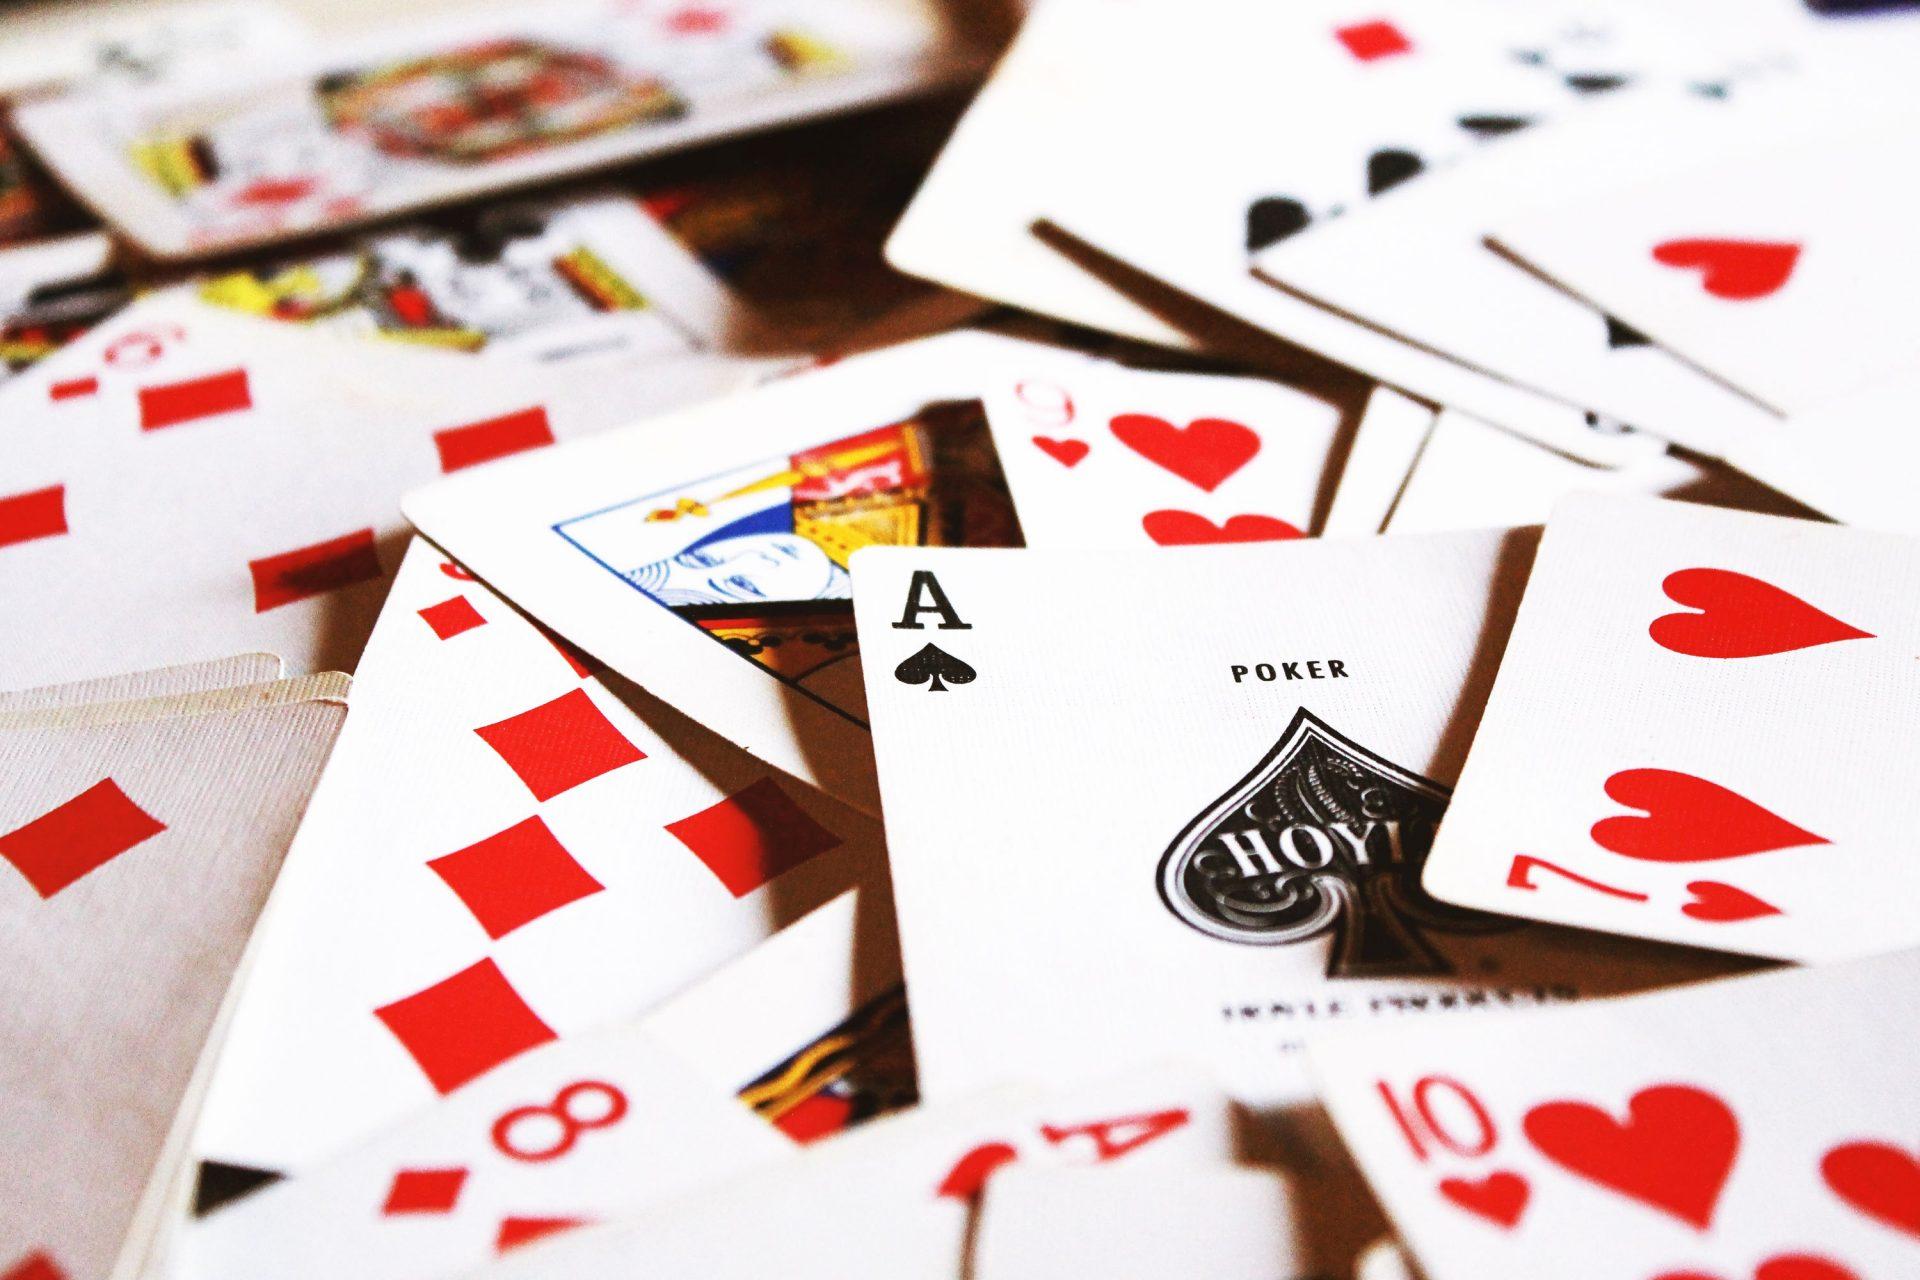 jack hamilton 9sews6loweu unsplash 10 - Fundamental Details On Online Poker Gambling Website